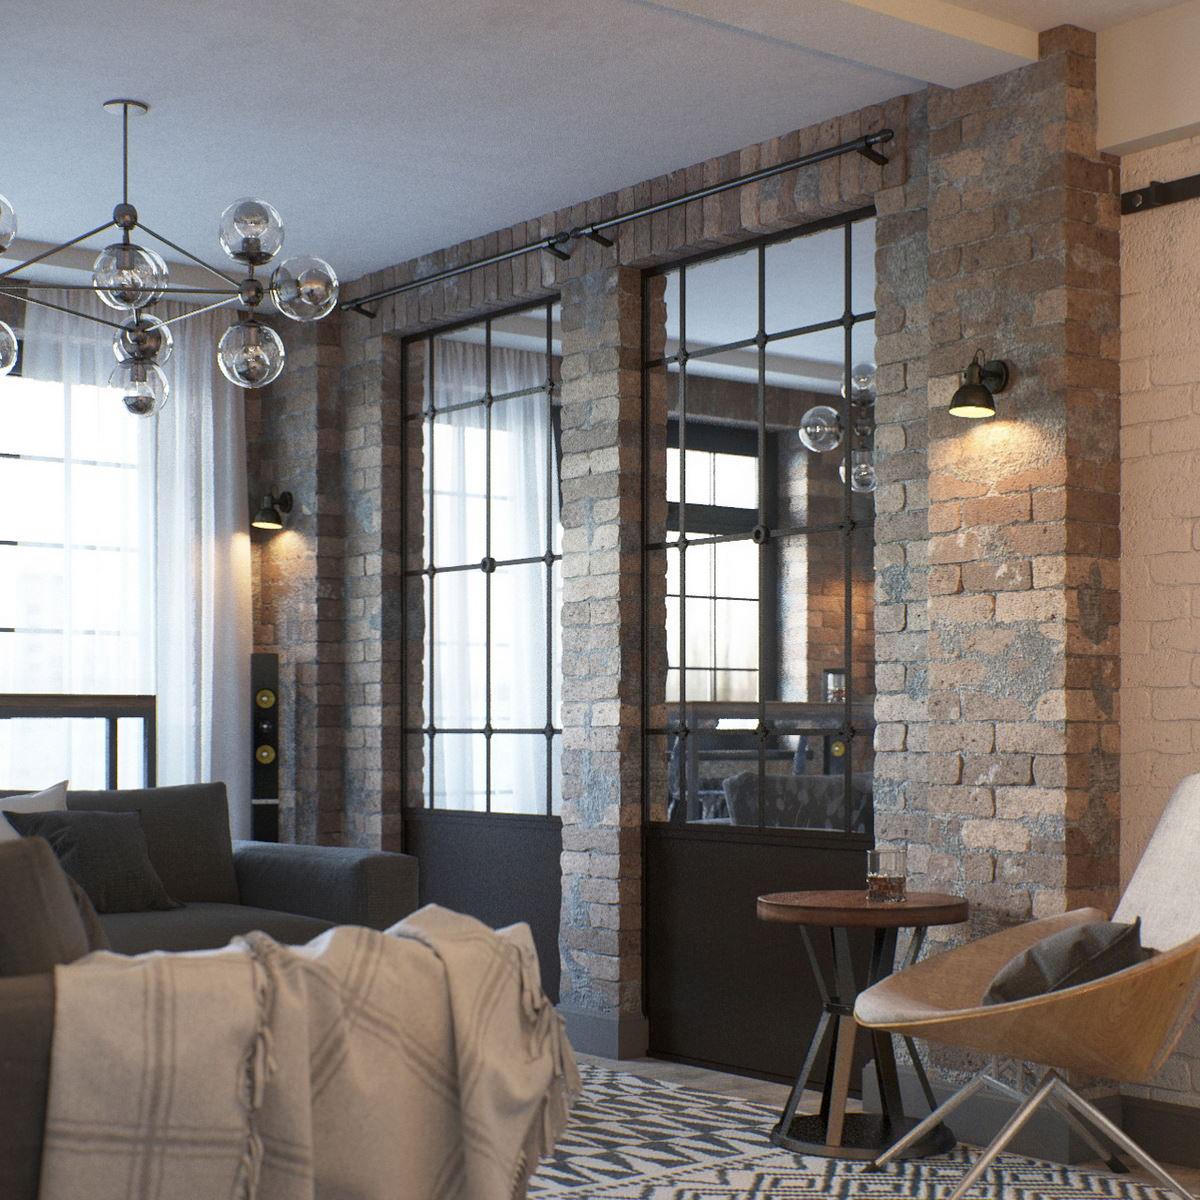 interior-3D-visualization-loft-room-mirrors